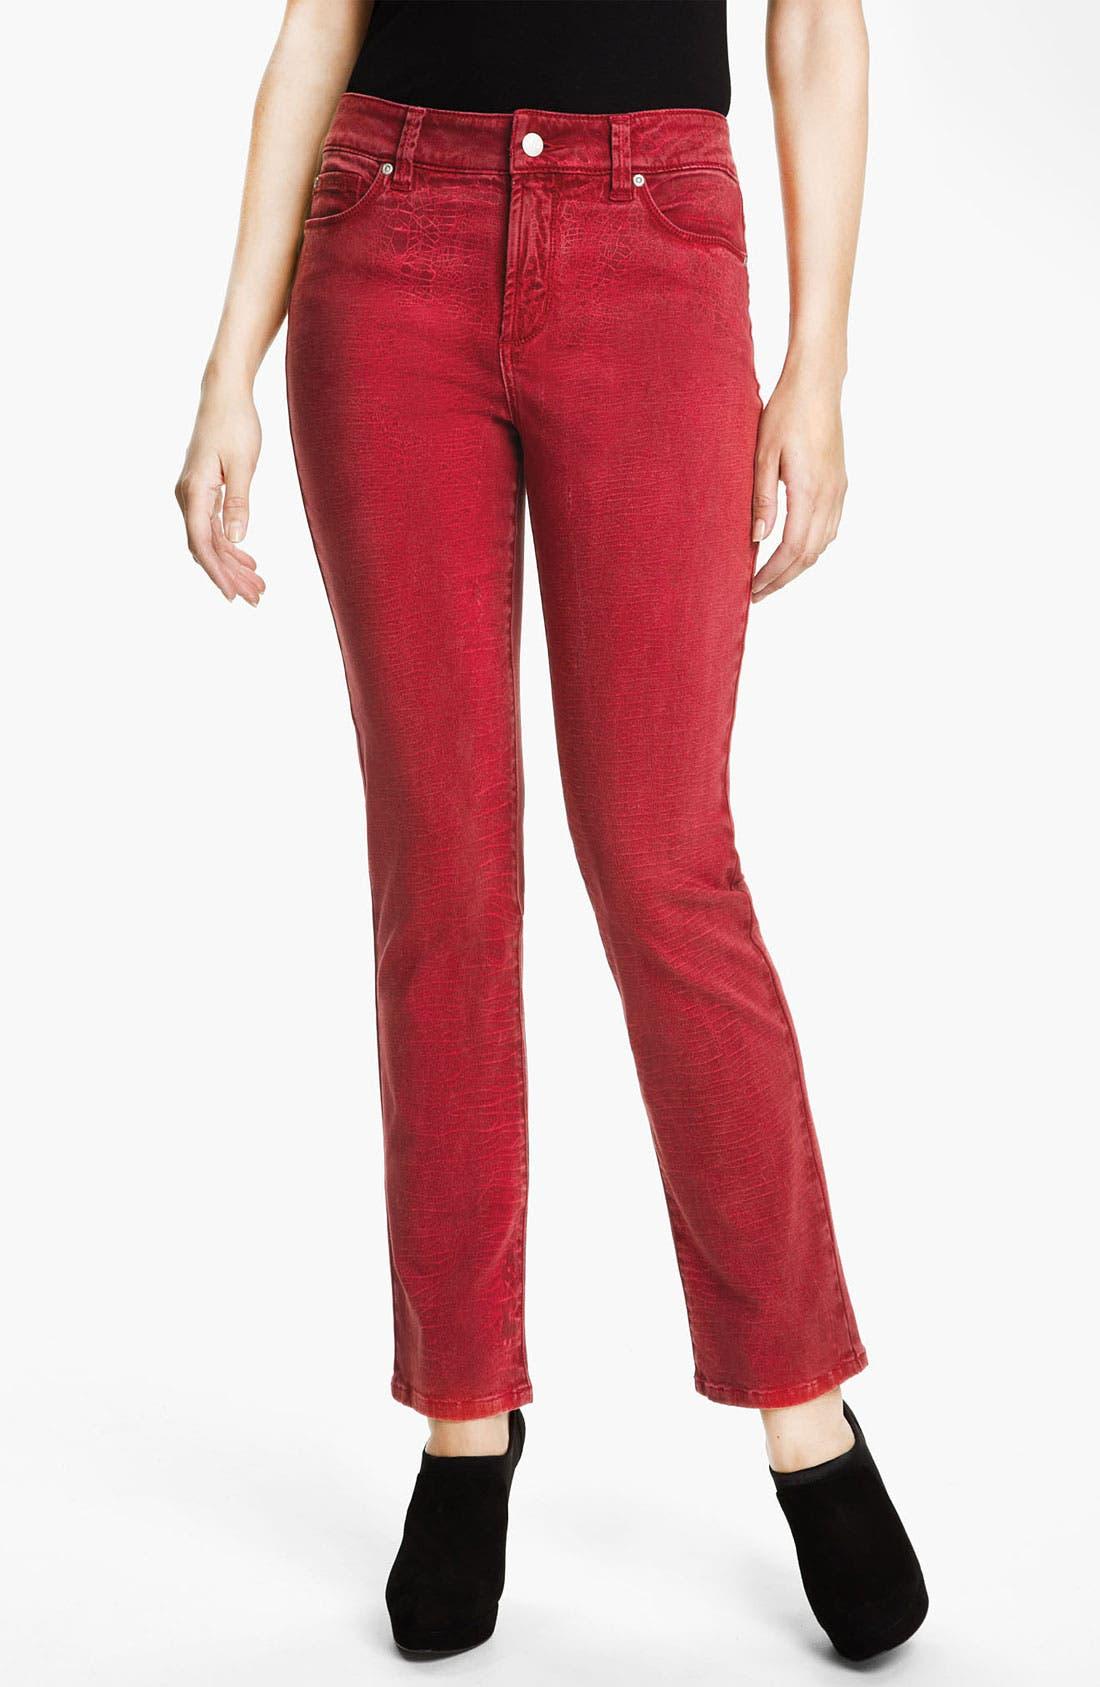 Alternate Image 1 Selected - NYDJ 'Sheri - Shattered' Print Skinny Twill Jeans